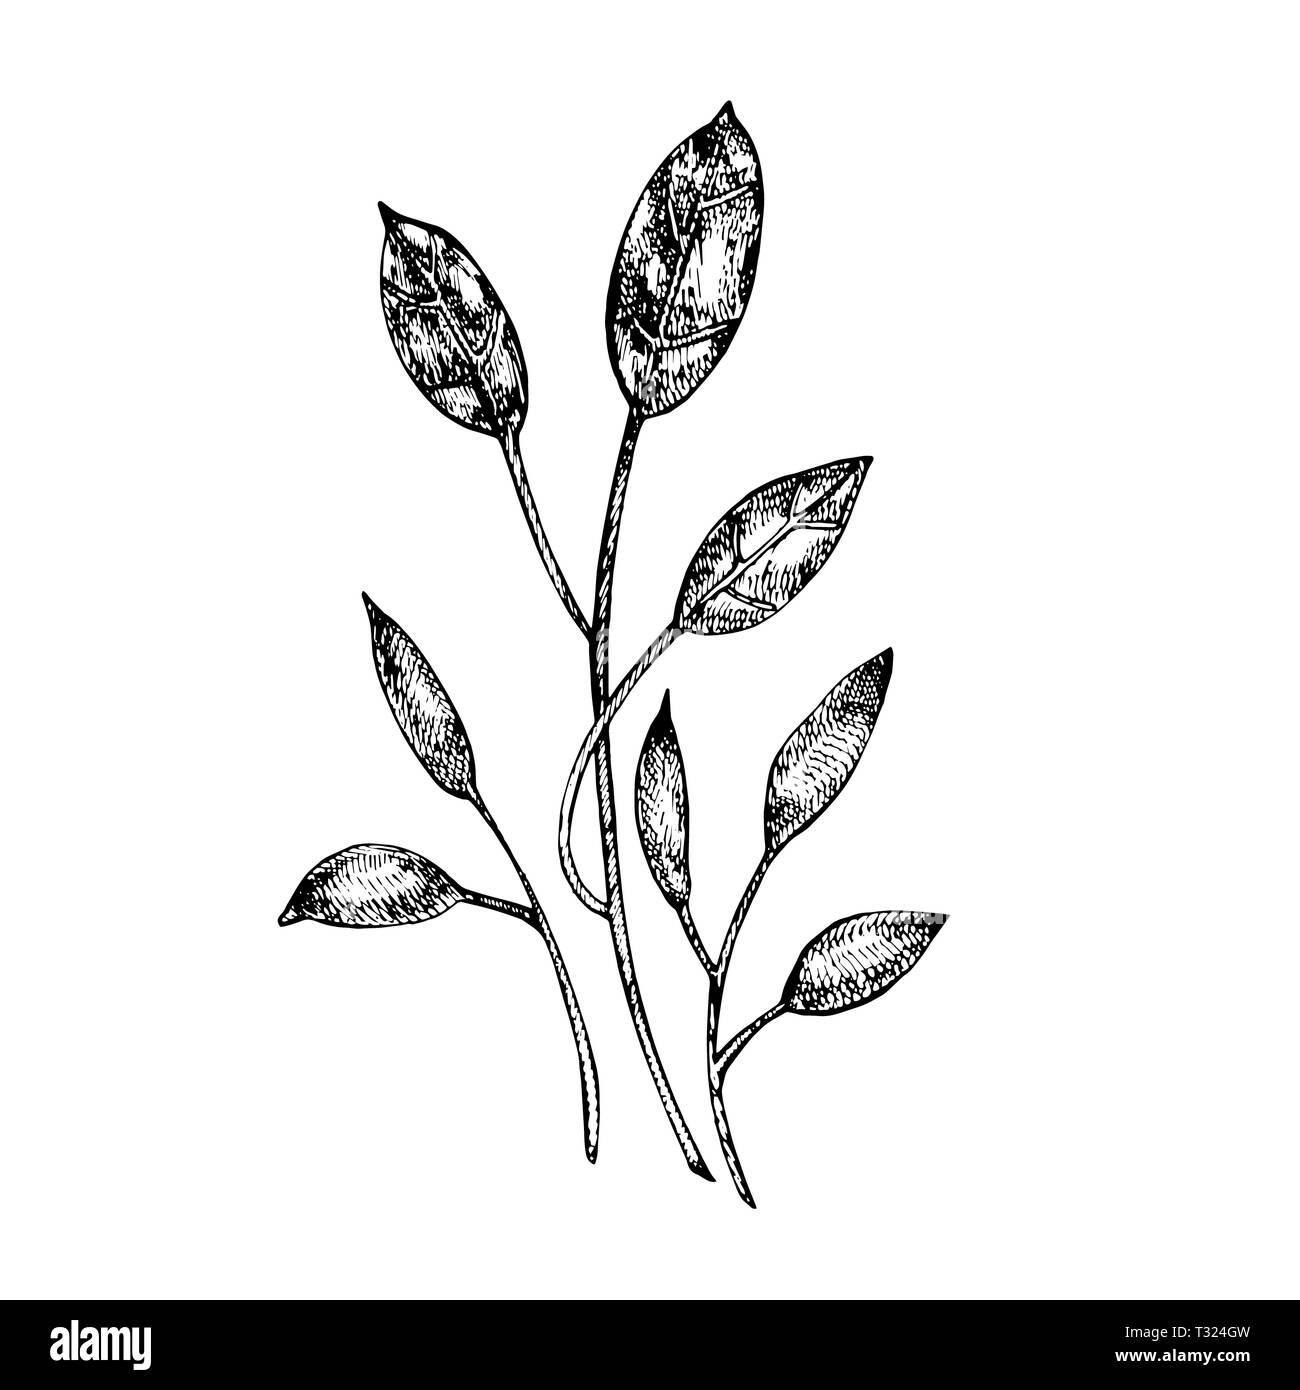 Grafic illustration of garden tools. Isolated on white background Stock Photo